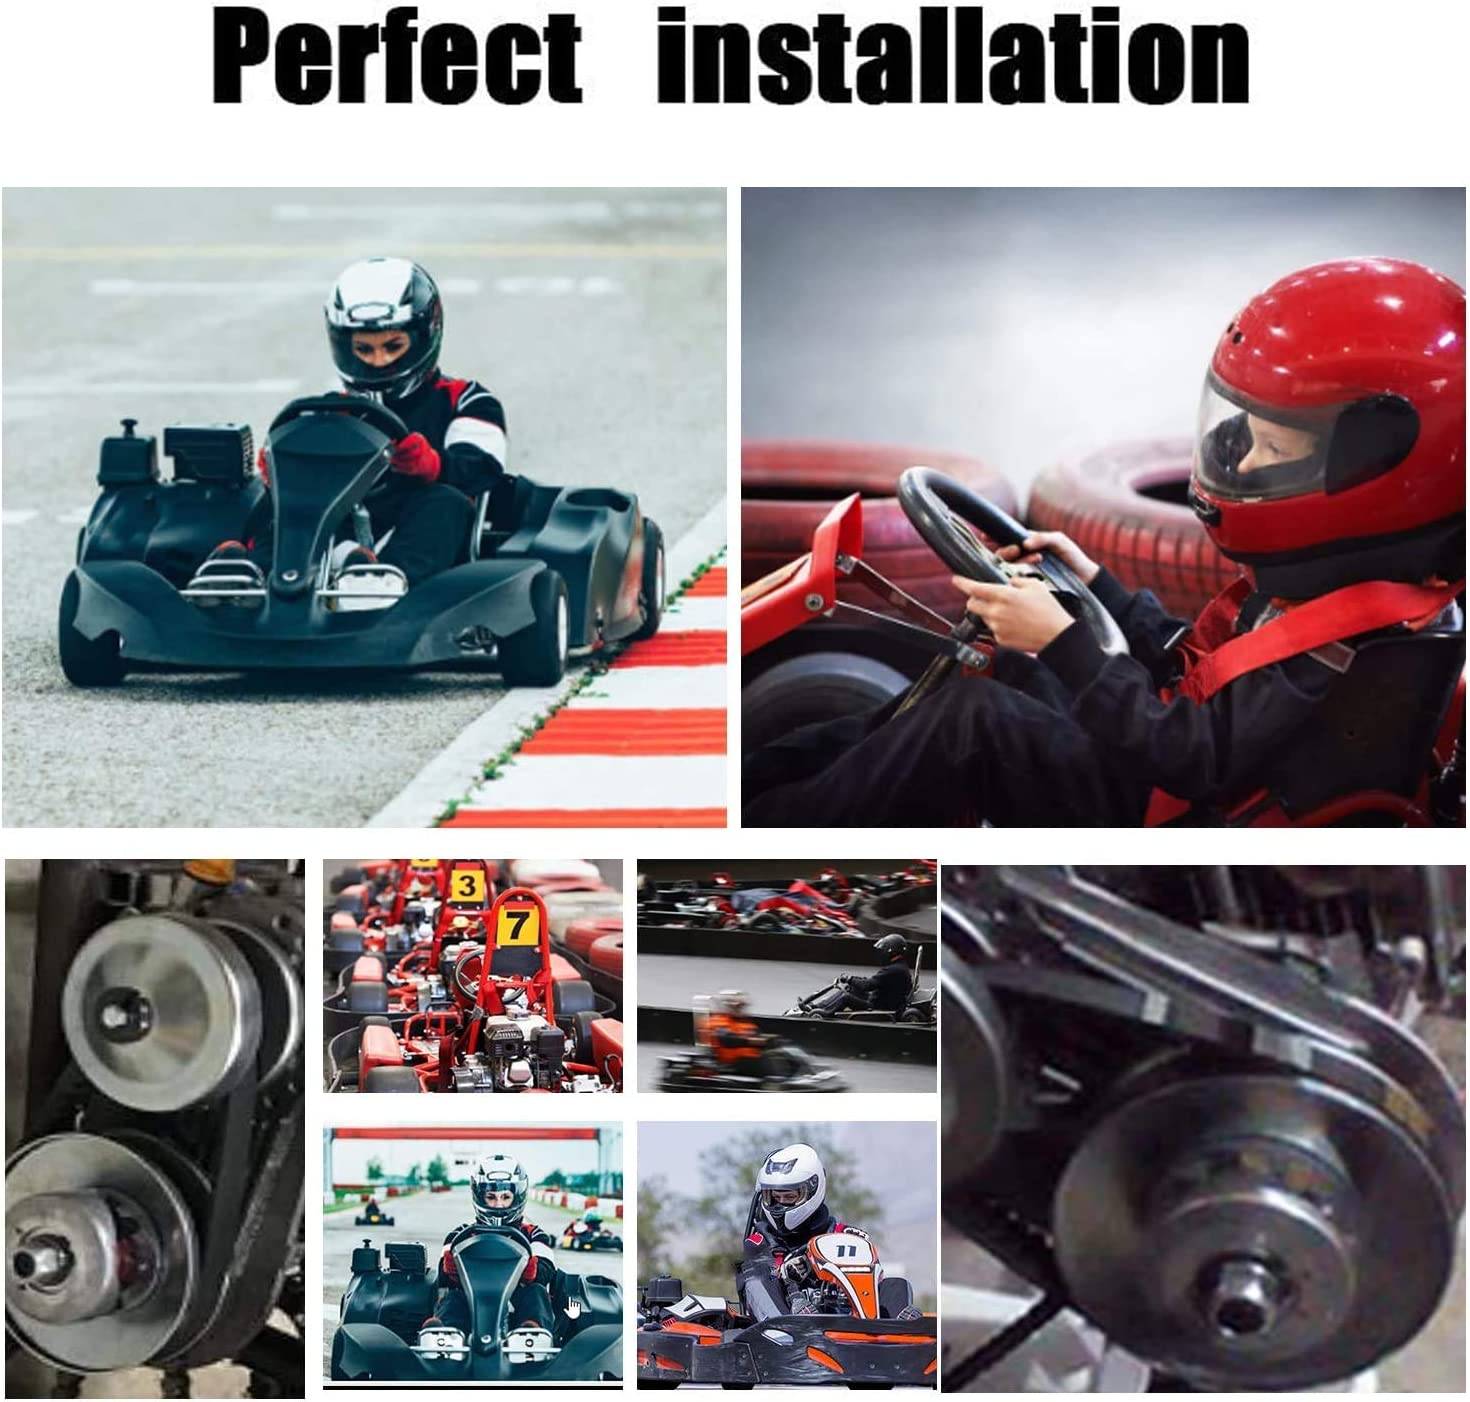 New 30 Series 6.5 HP Go Kart//Mini Bike Torque Converter Clutch Driver Pulley Replacement Comet Manco 212CC 3//4 Bore Max Torque